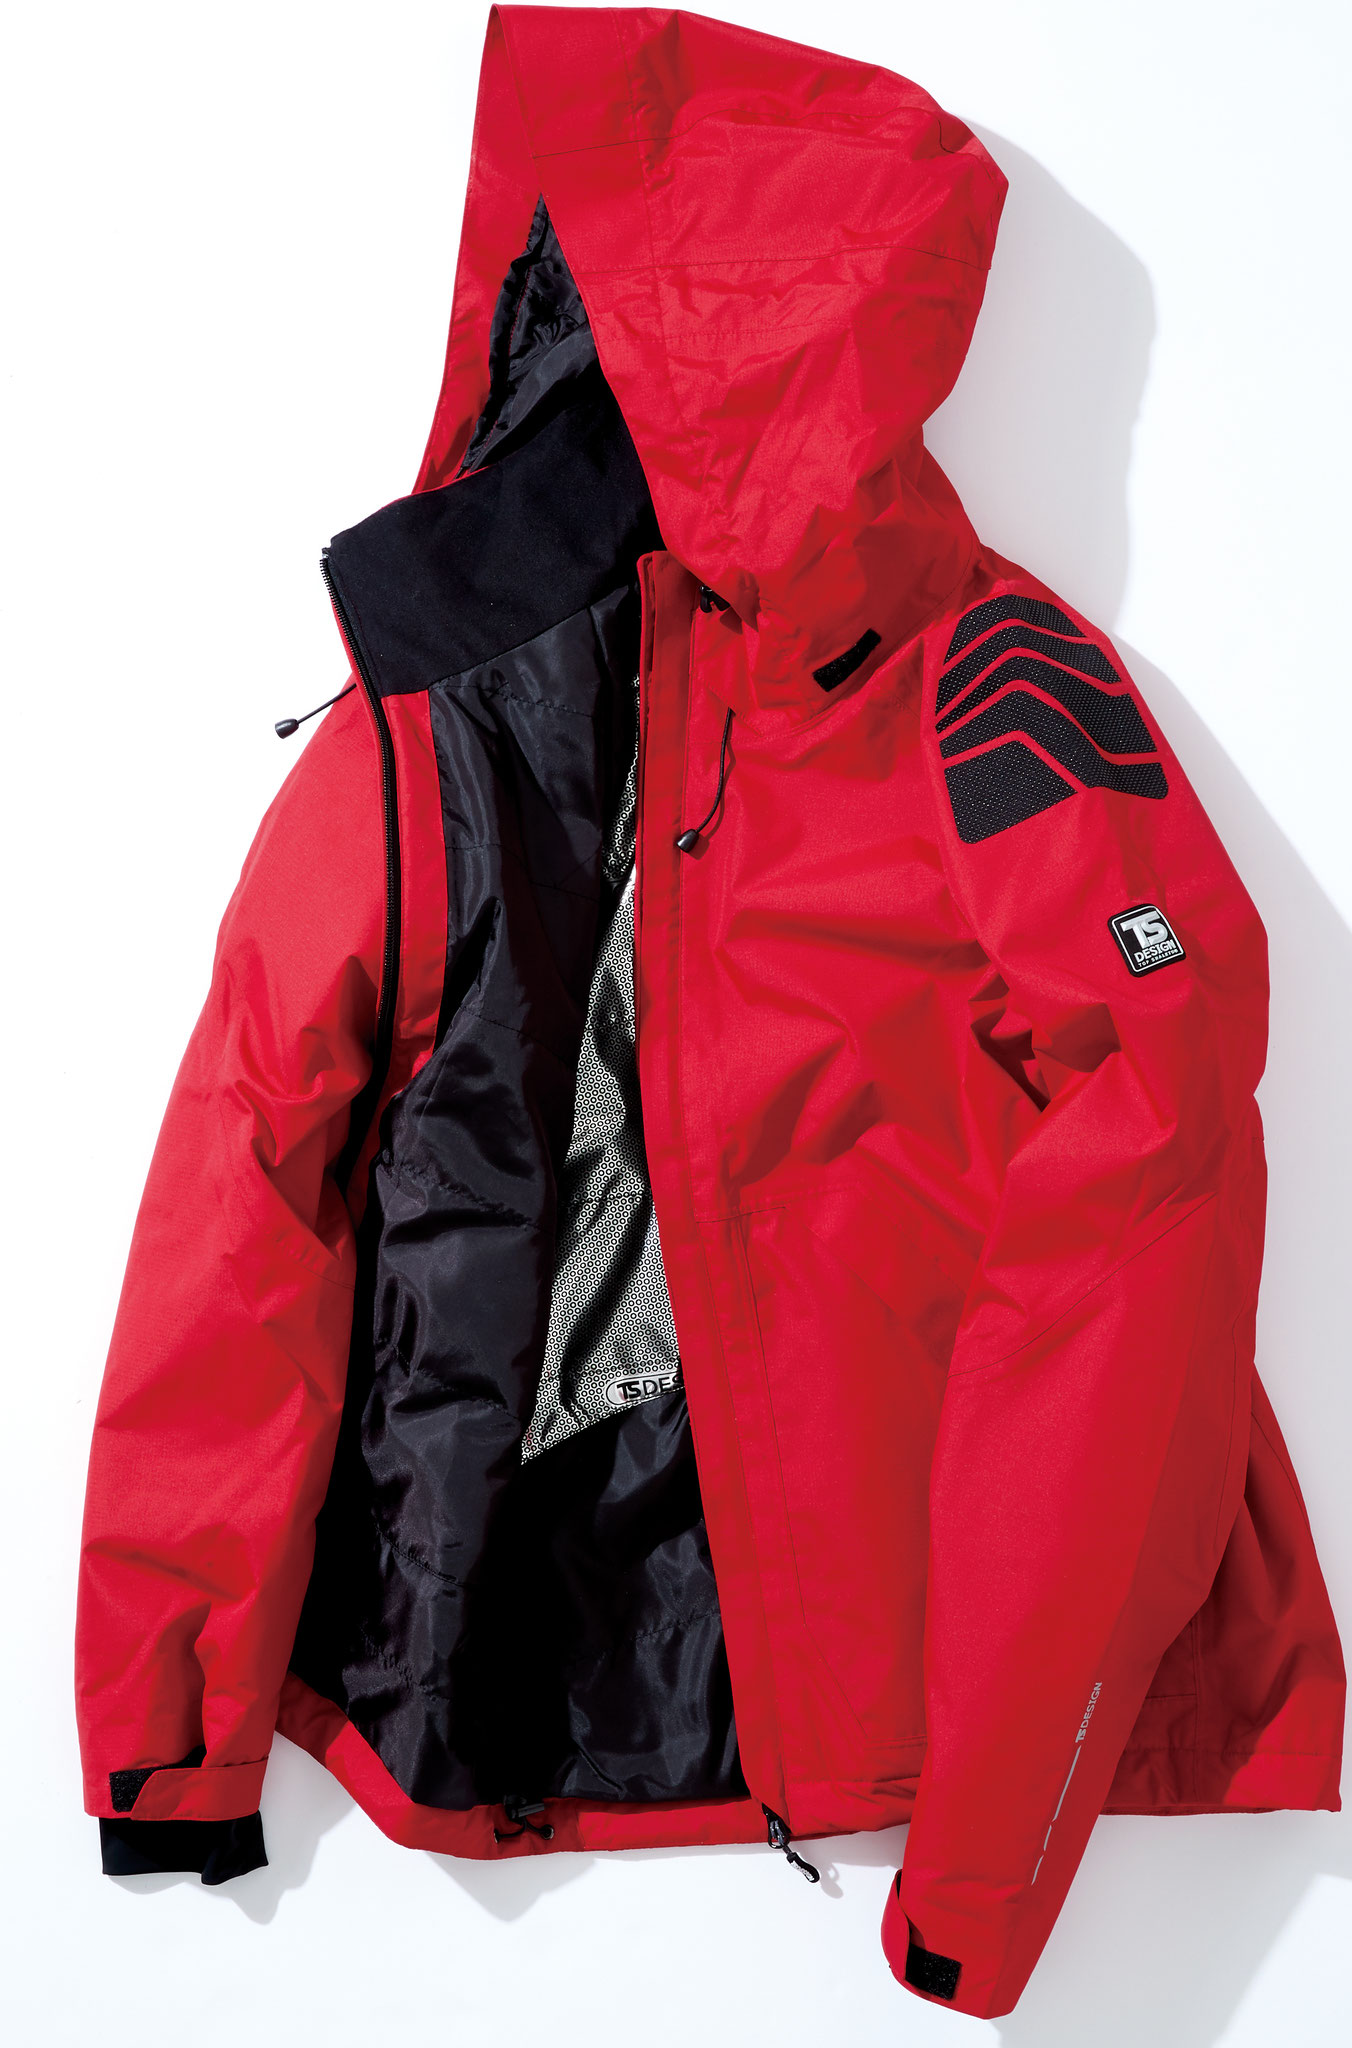 TS DESIGN(TSデザイン)18226 メガヒート防水防寒ジャケット ¥12,900(税込)